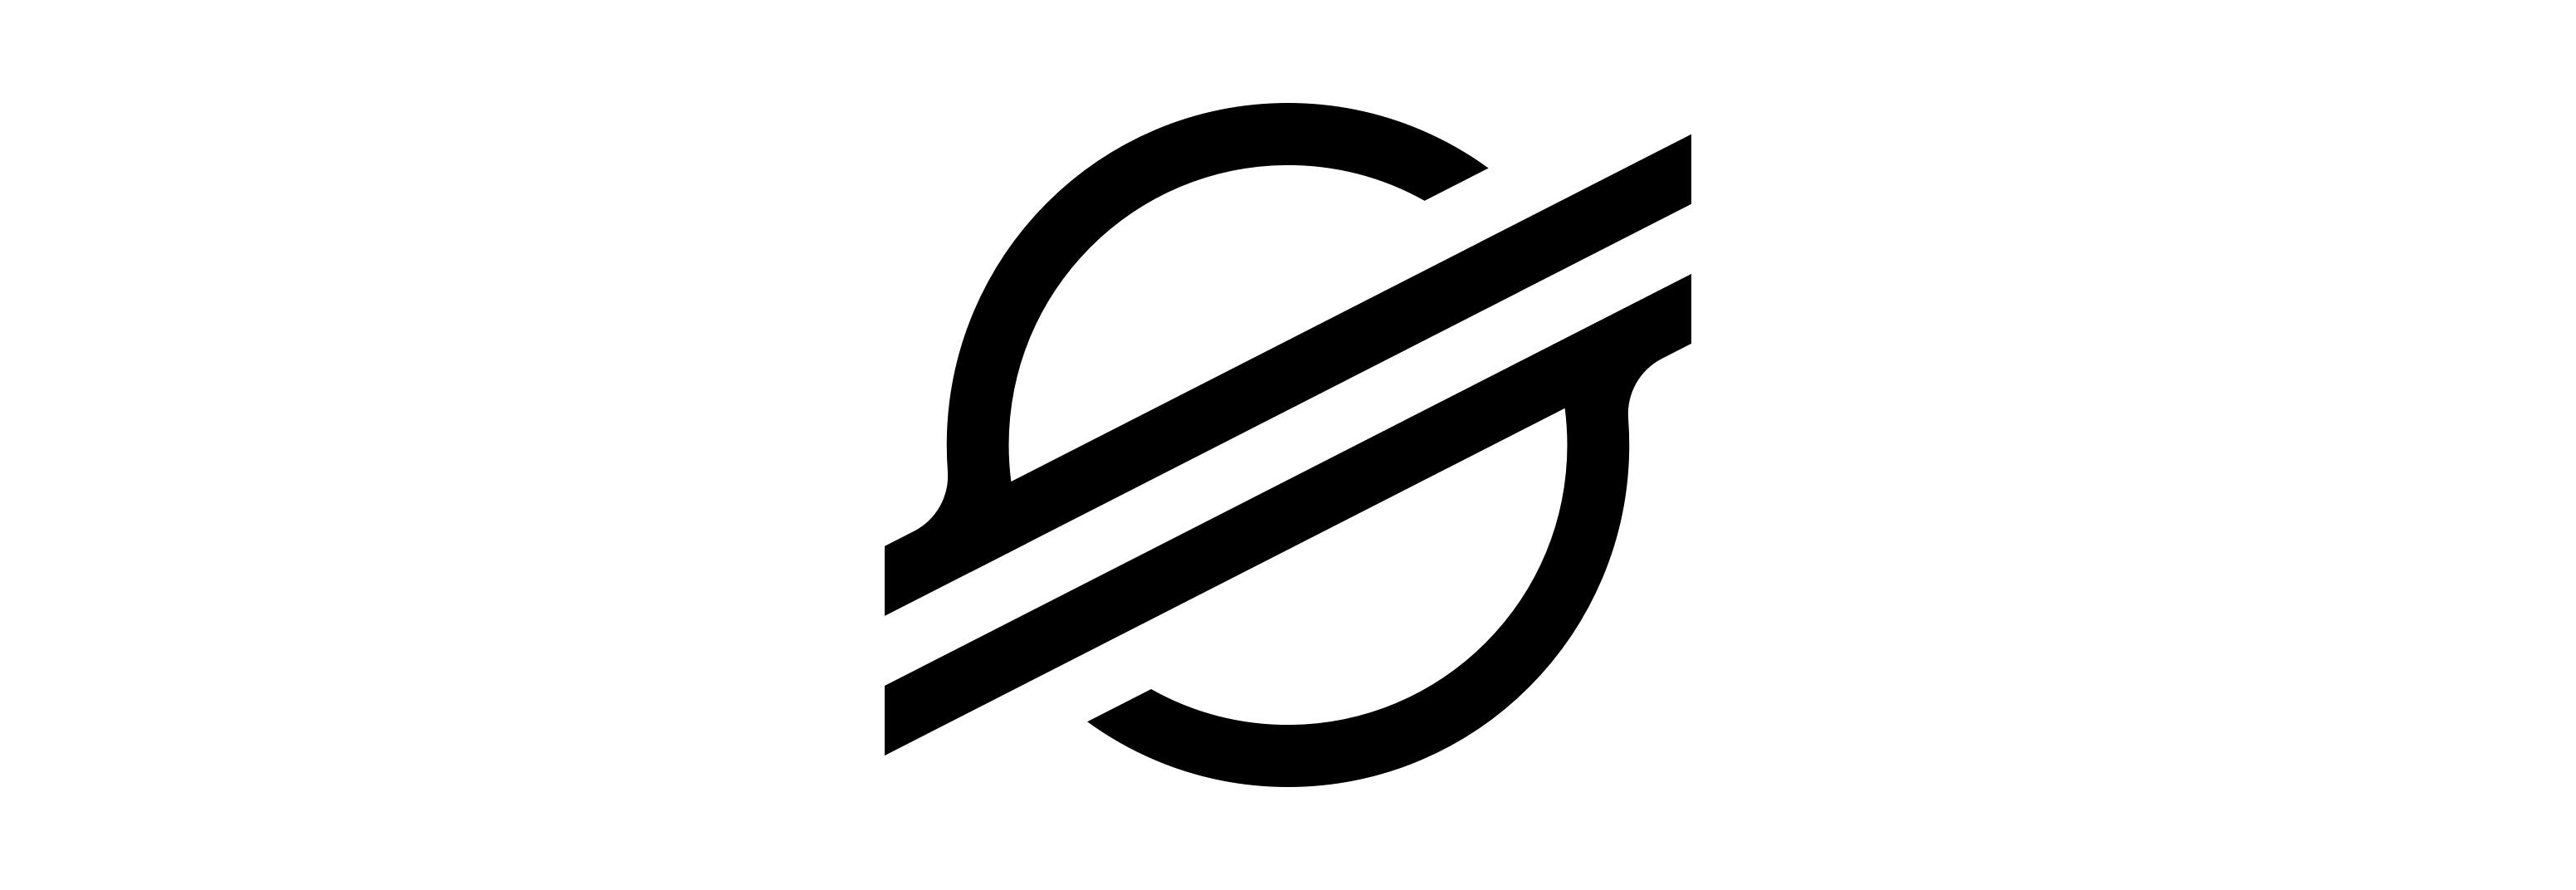 stellar-logo-only-1